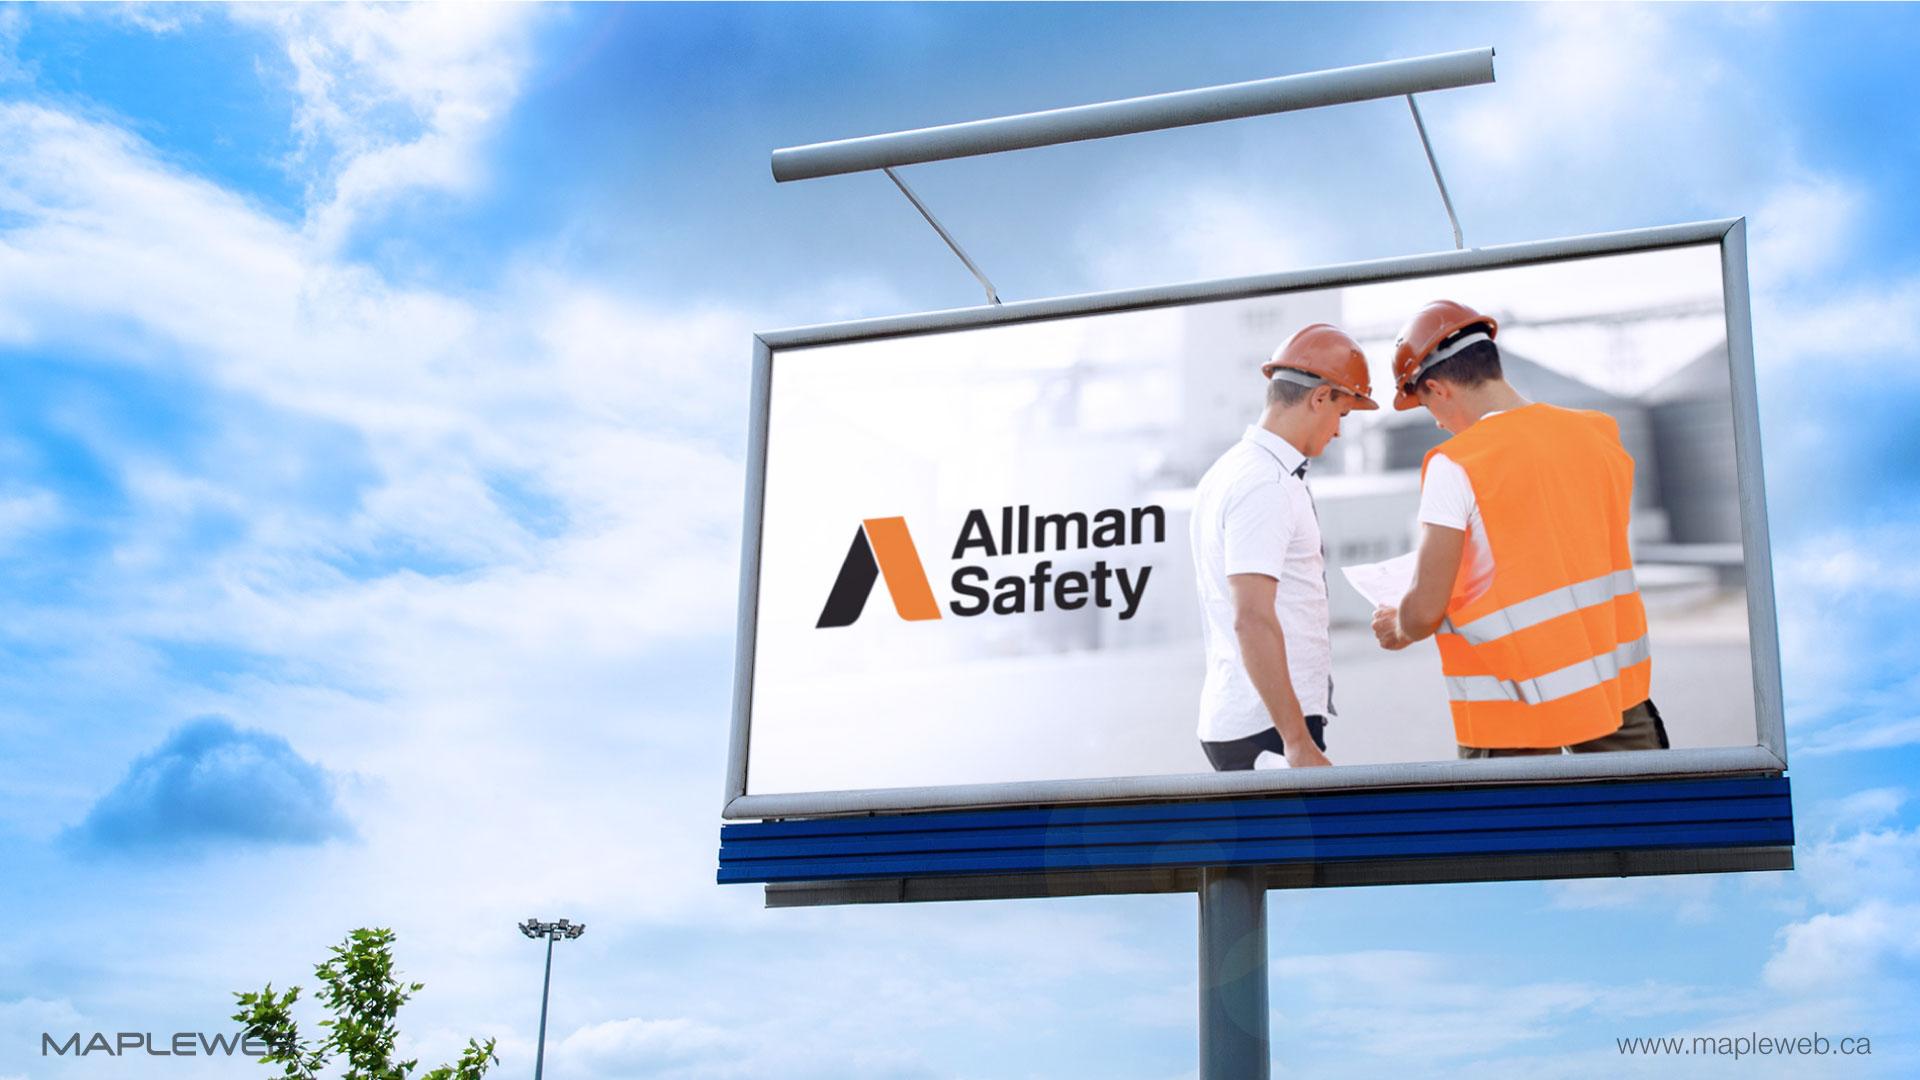 allman-safety-brand-logo-design-by-mapleweb-vancouver-canada-billboard-mock